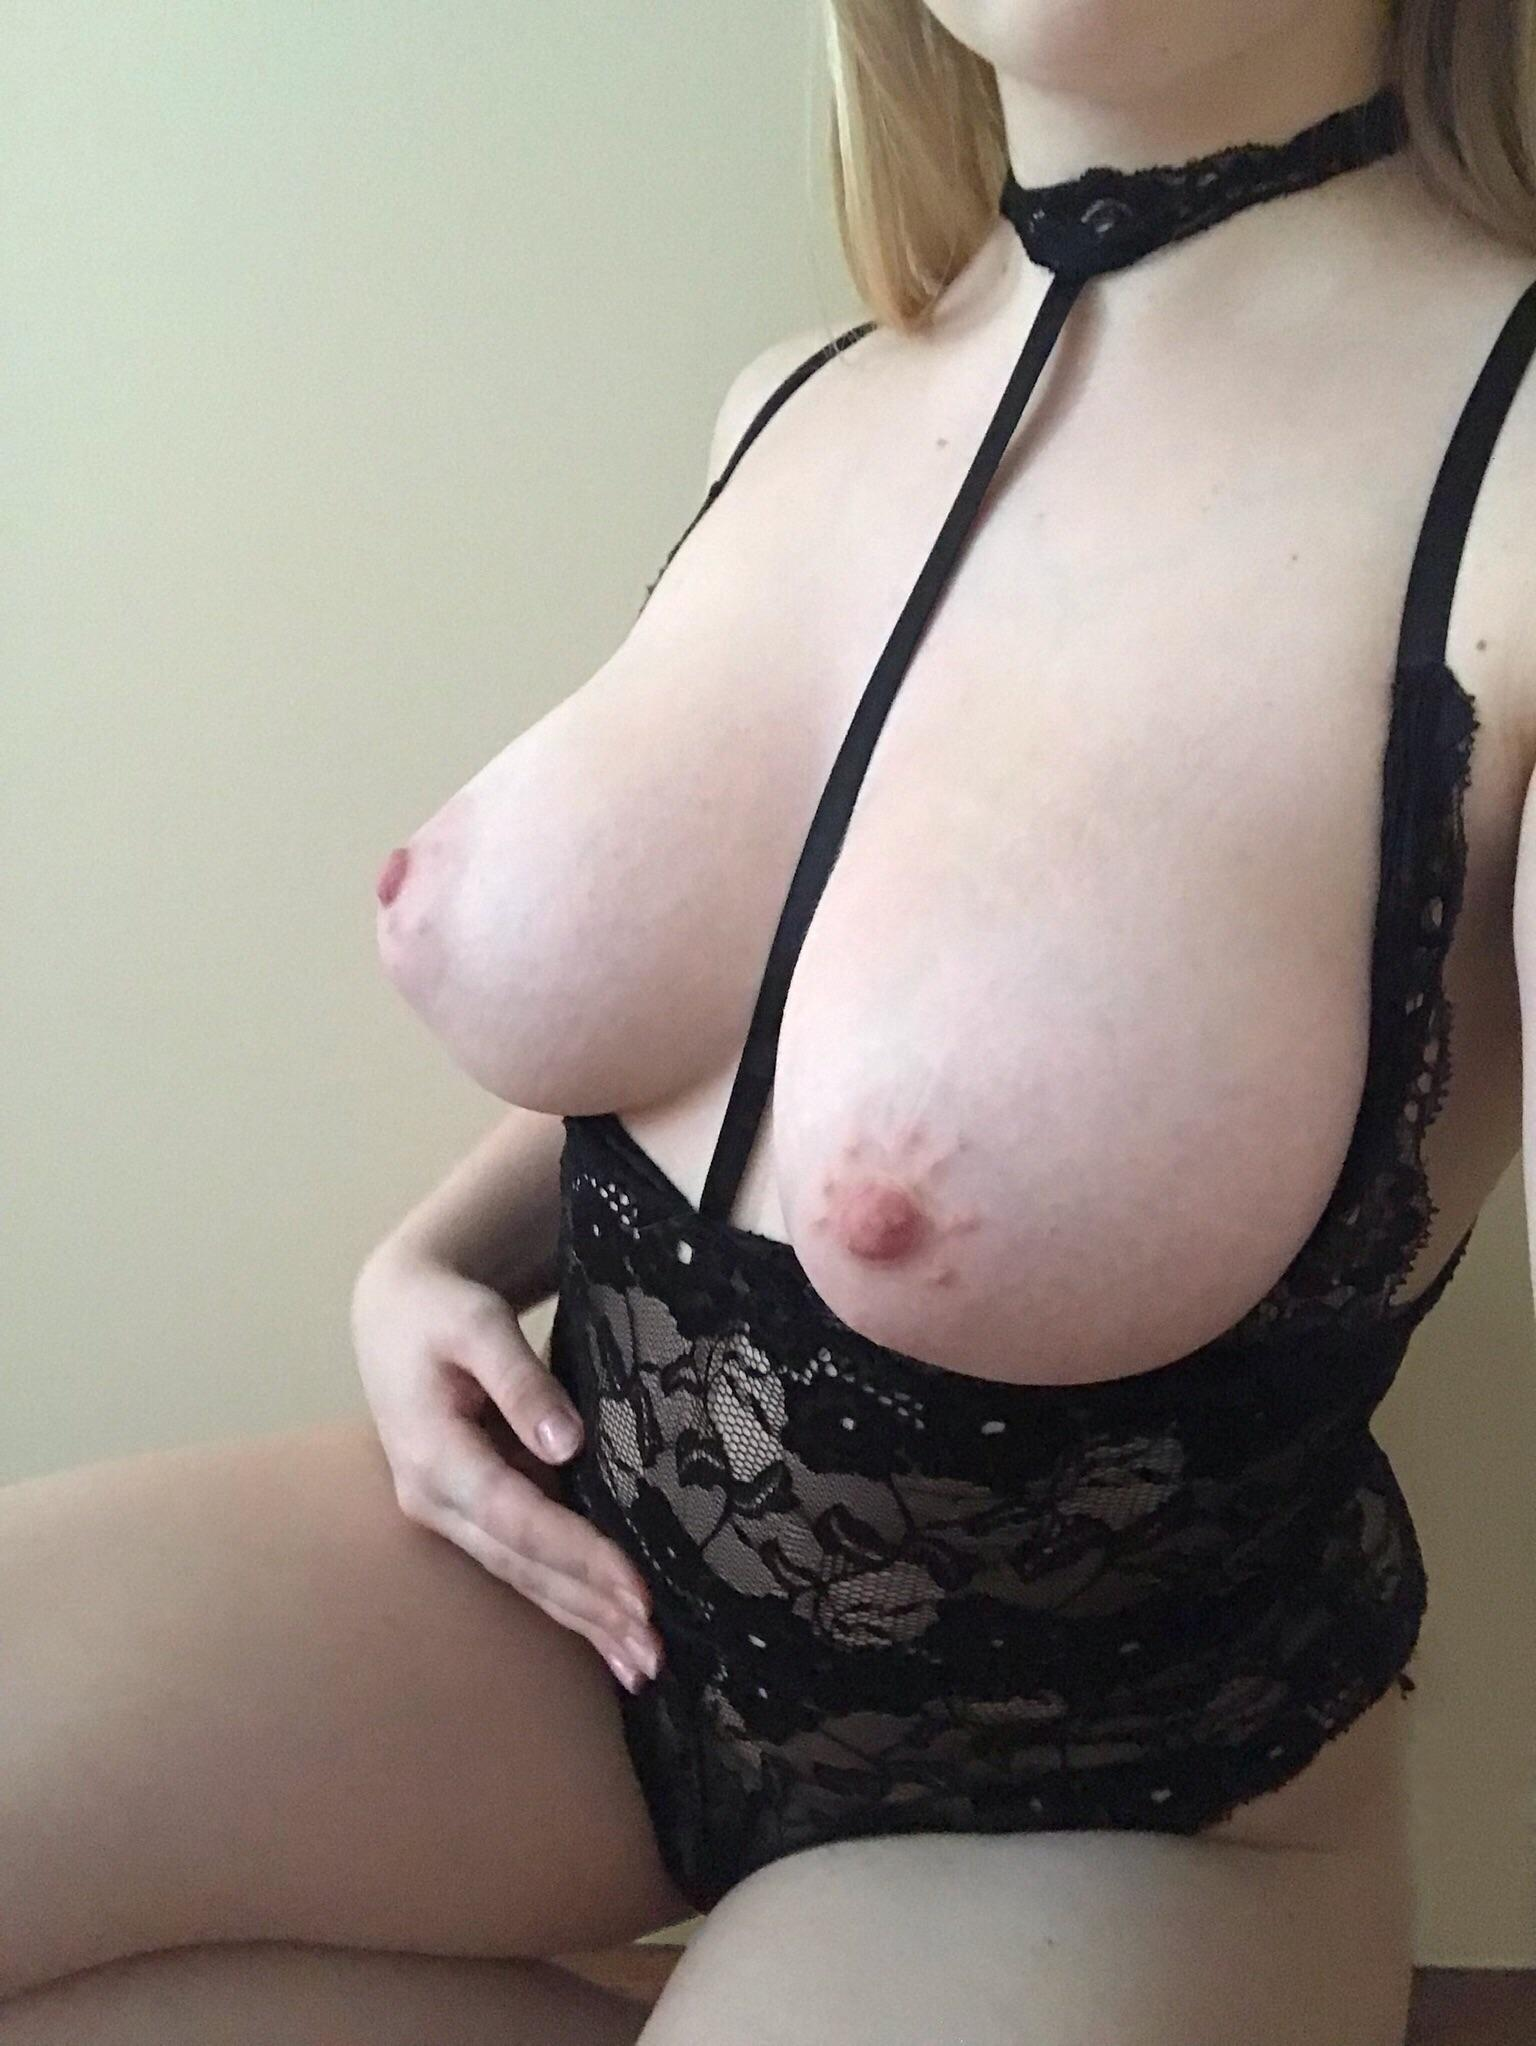 fotos de esposas desnudas fotos porno caseras y amateurs esposas y maridos para sexo follar, coger, intercambio, trios, cornudos xxx